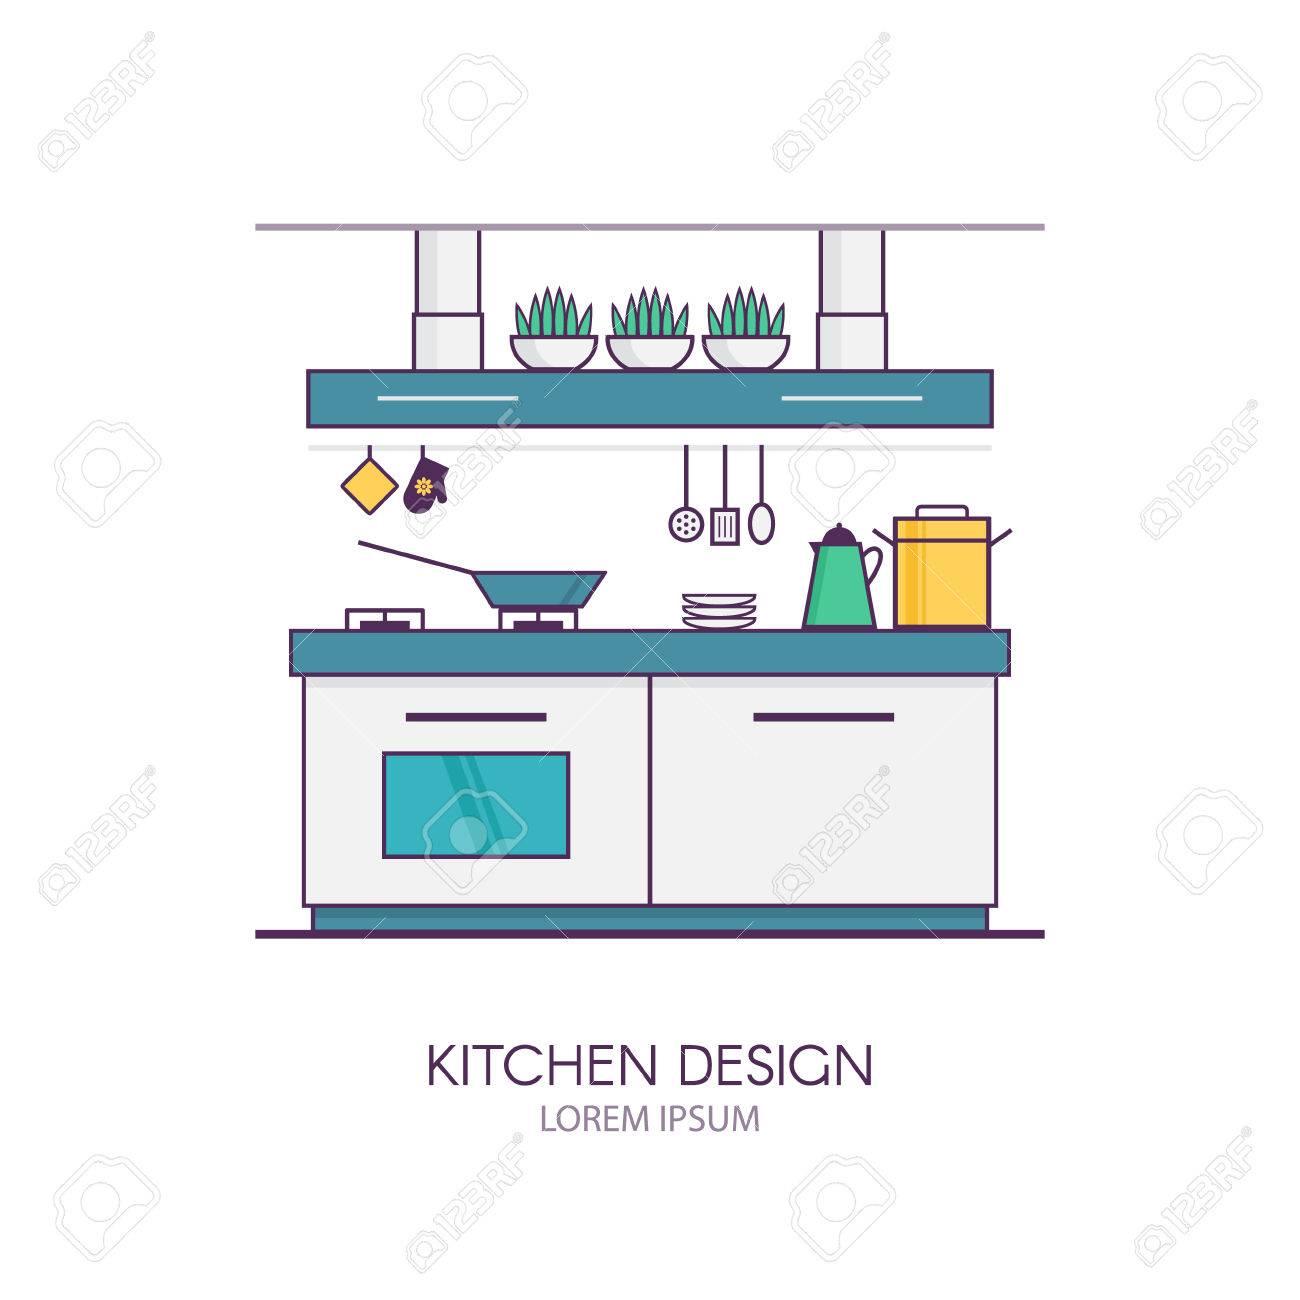 Modern Kitchen Interior Design In Linear Flat Style. Concept ...